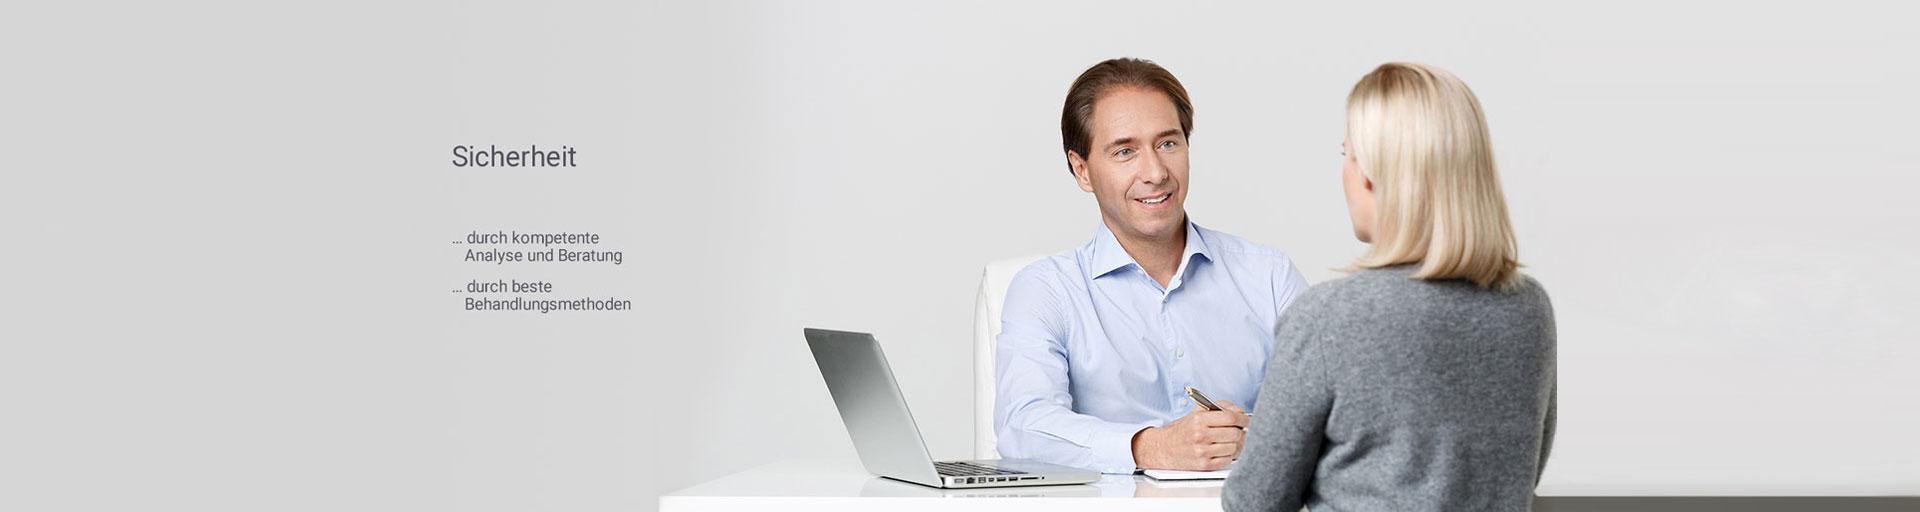 Rekonstruktive Chirurgie Frankfurt - Praxis Dr. med. Holle und Kollegen